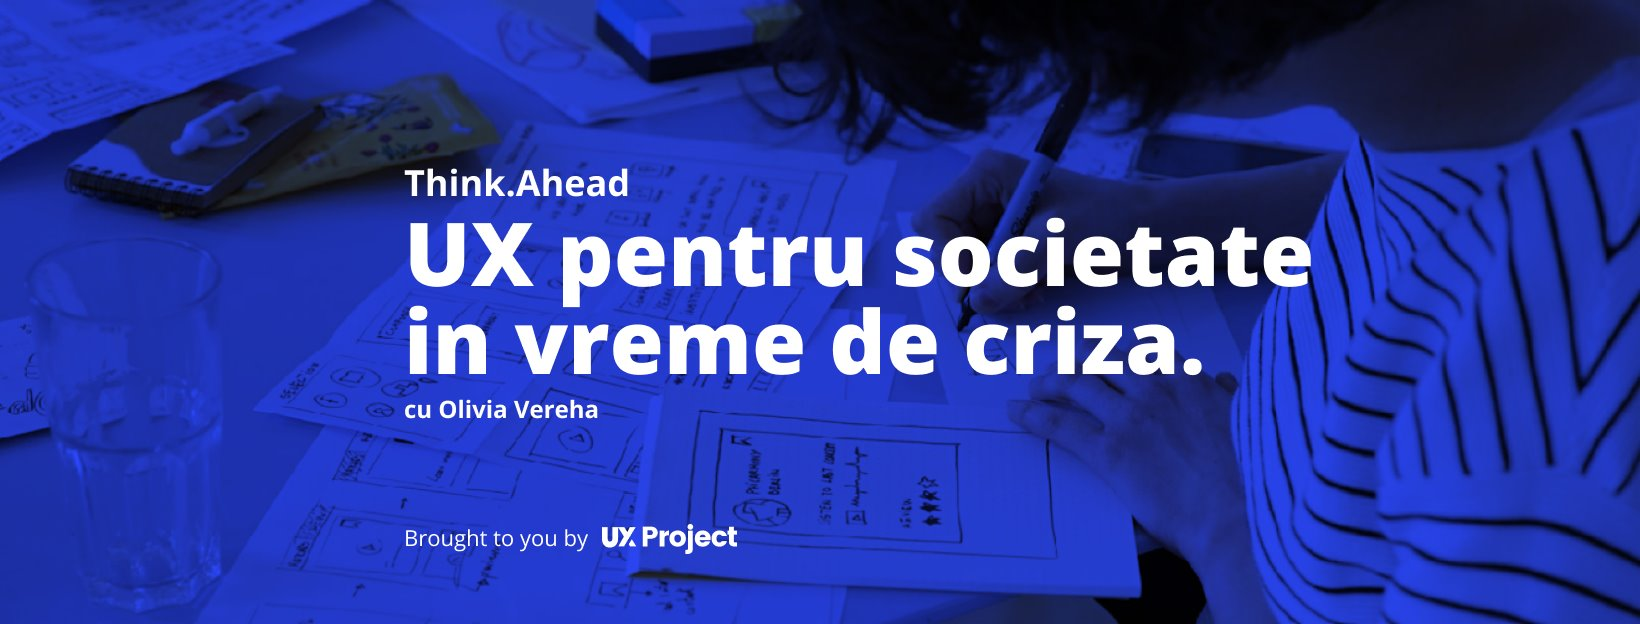 UX pentru societate in vreme de criza